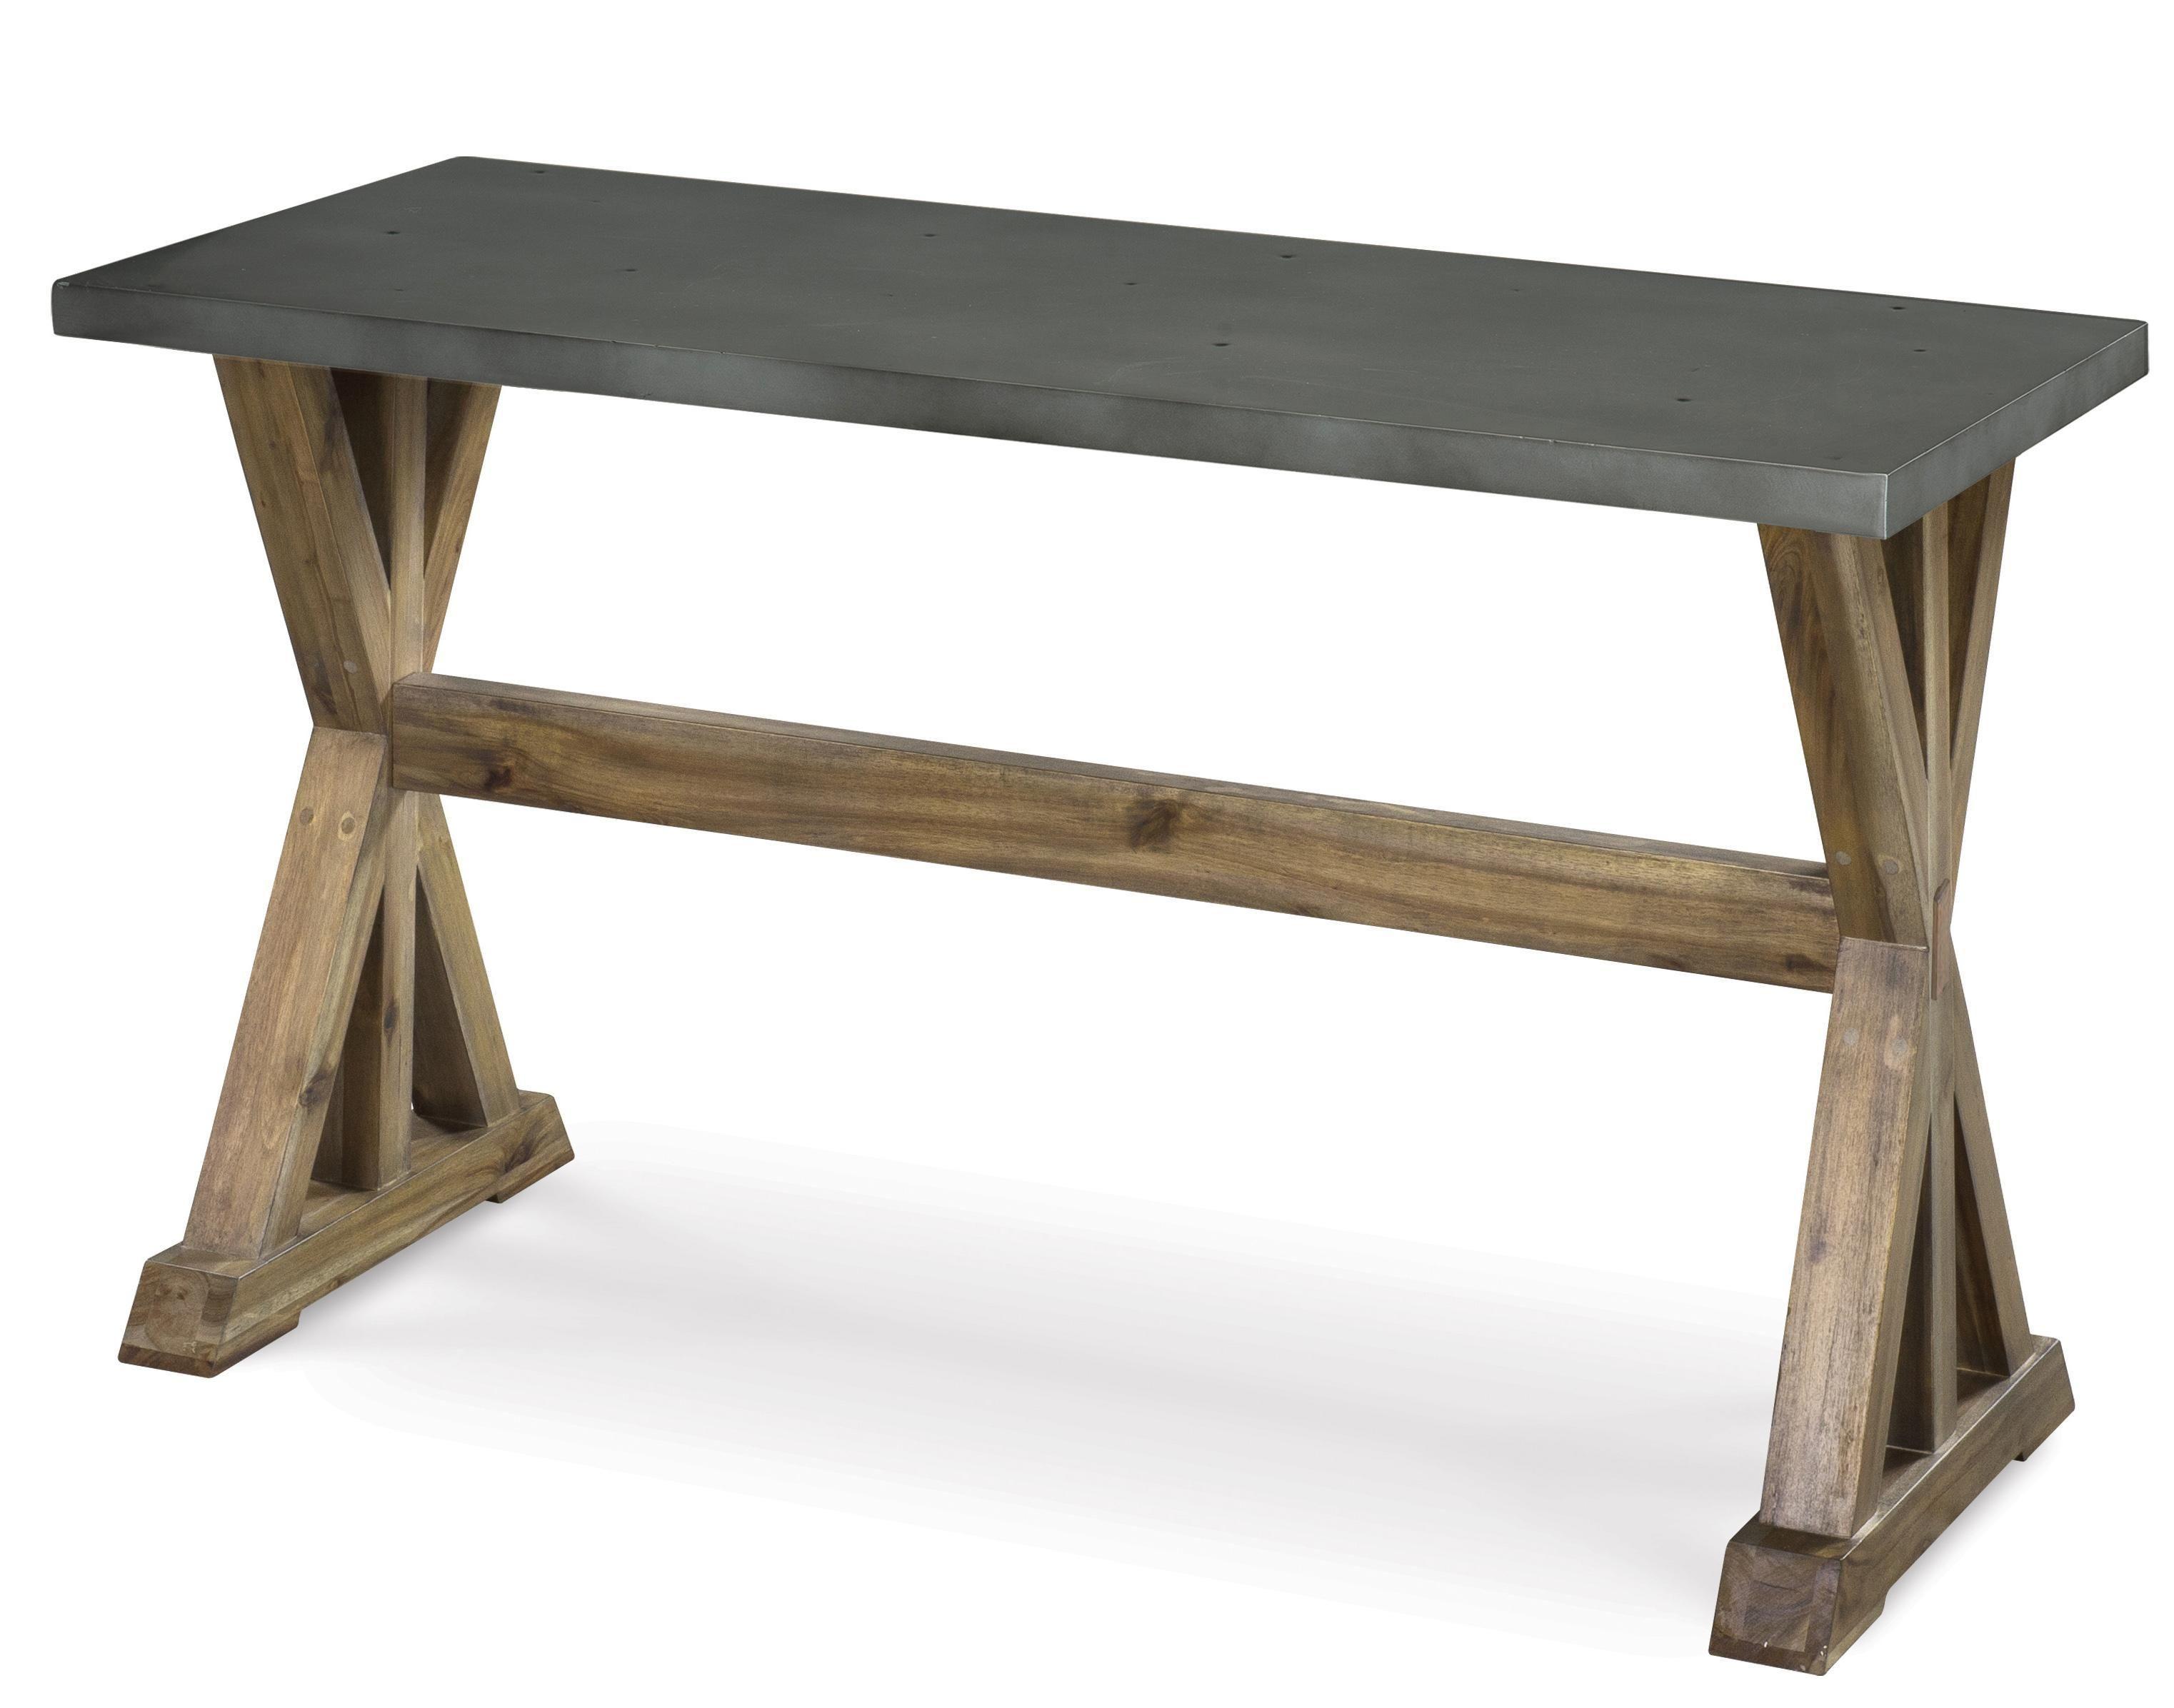 Sofa Beds Lybrook Rectangular Sofa Table by Magnussen Home